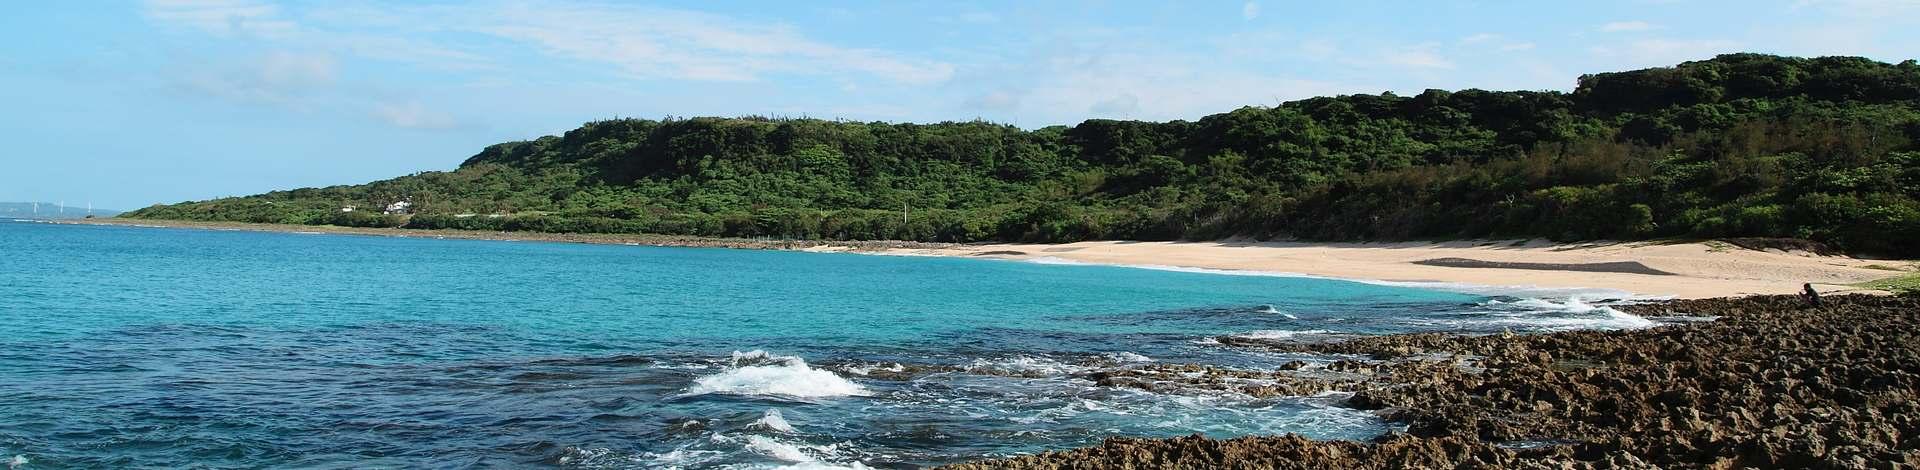 Taïwan Pacifique mer plage Kenting